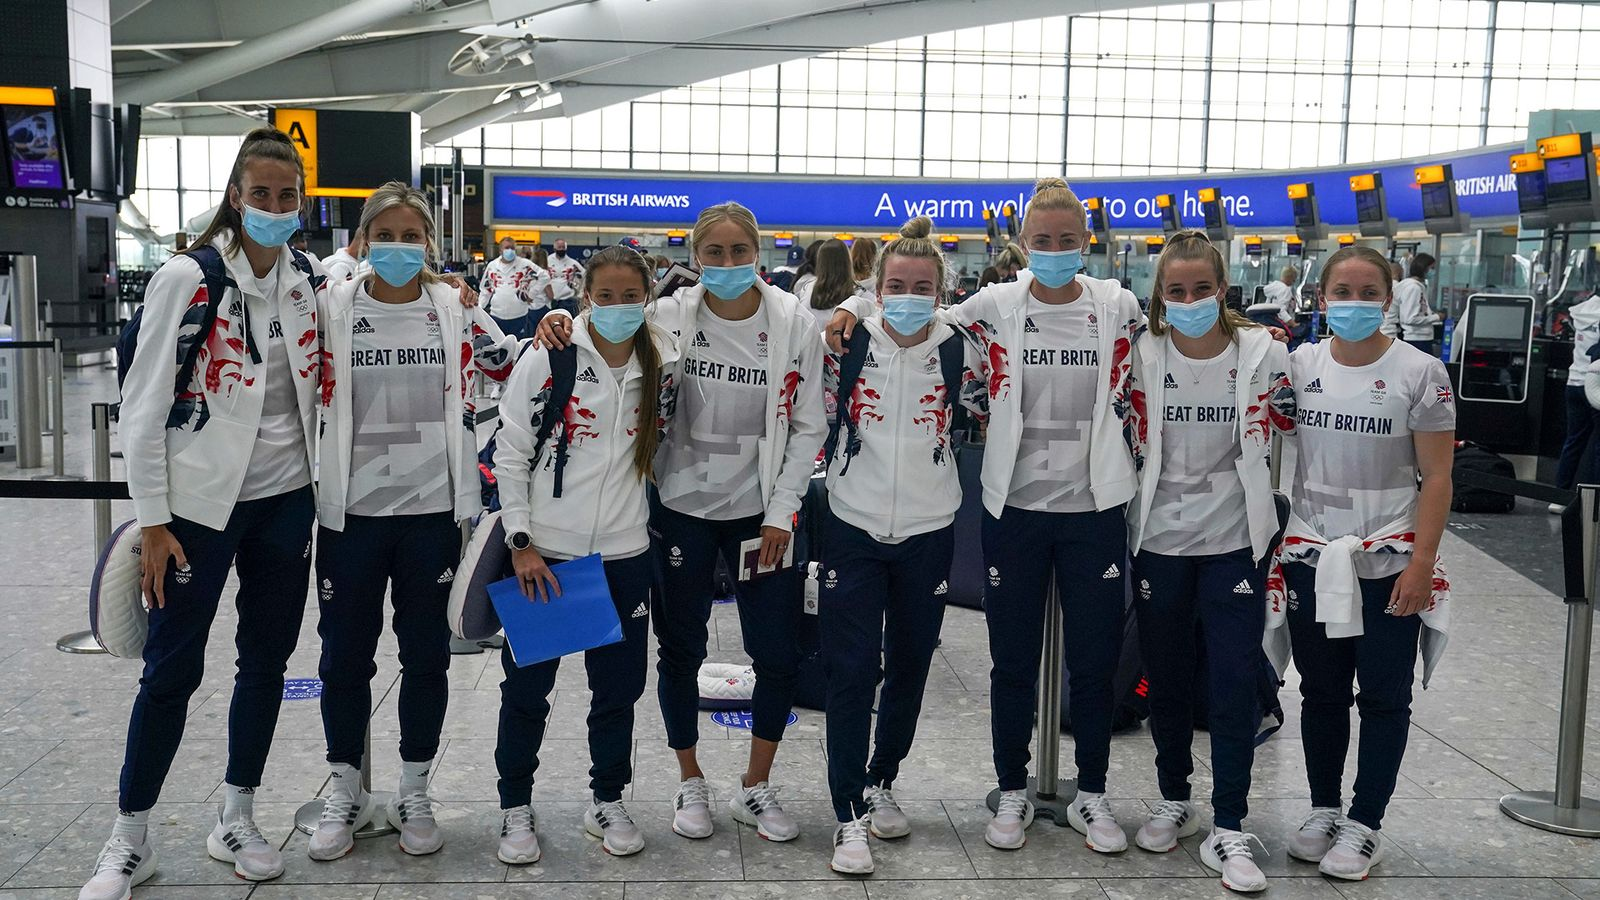 Olympics: Meet The Team GB Women's Football Team Who Are